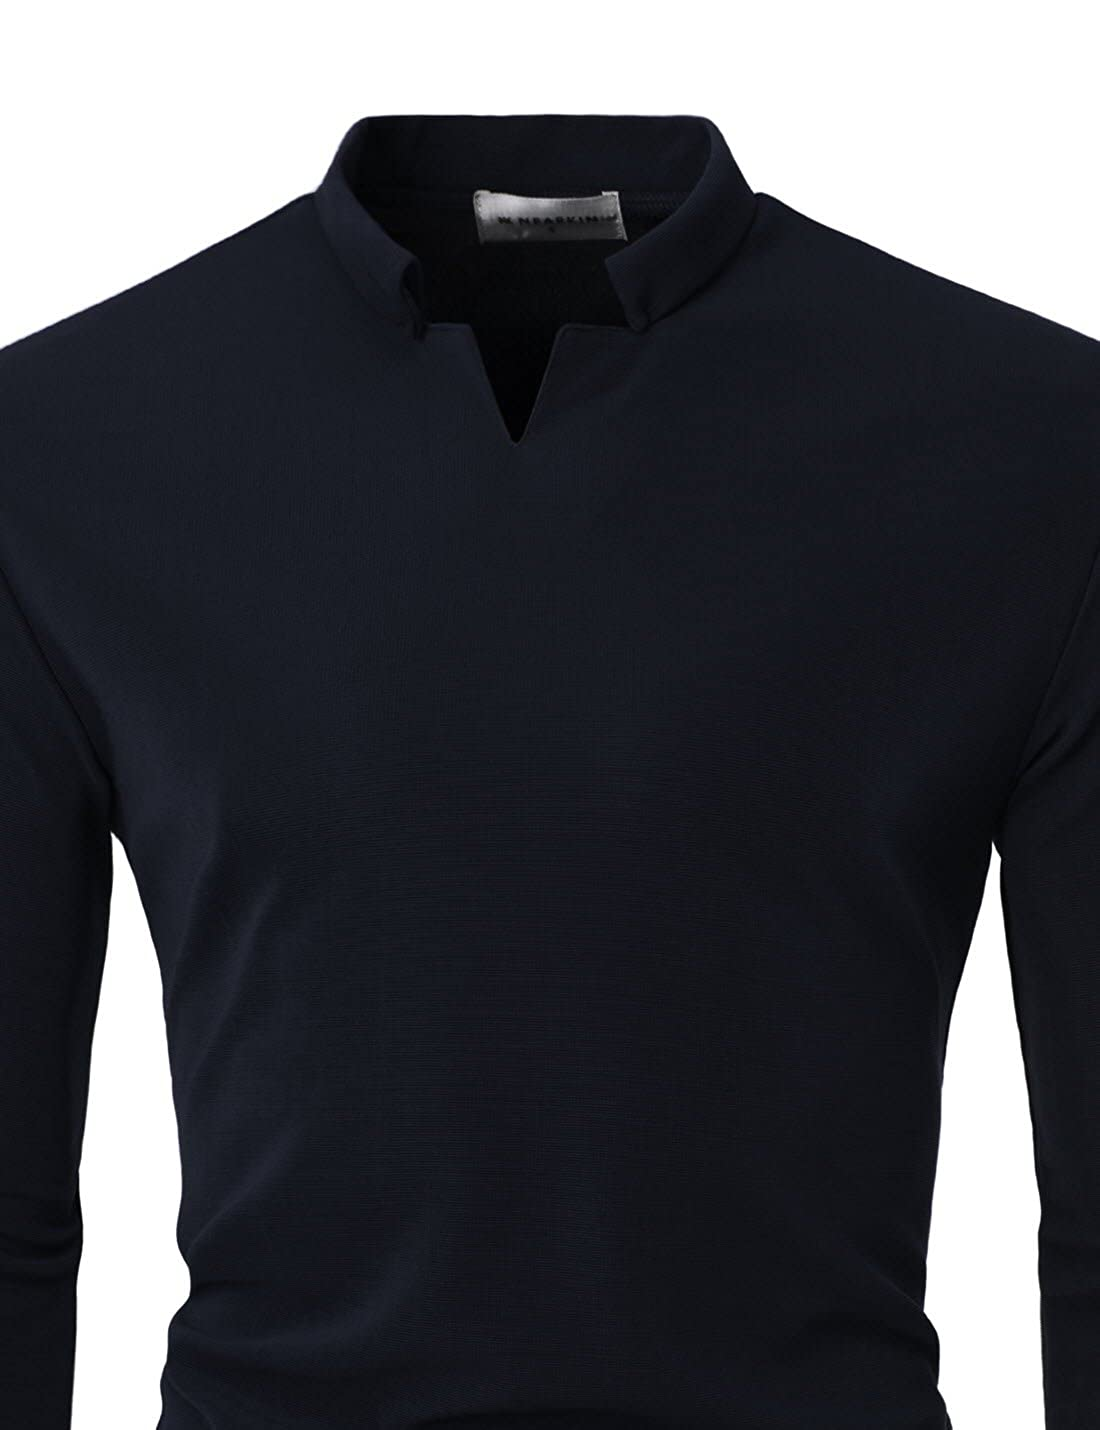 090bb1840 Kohls Womens Black Button Down Shirt - DREAMWORKS